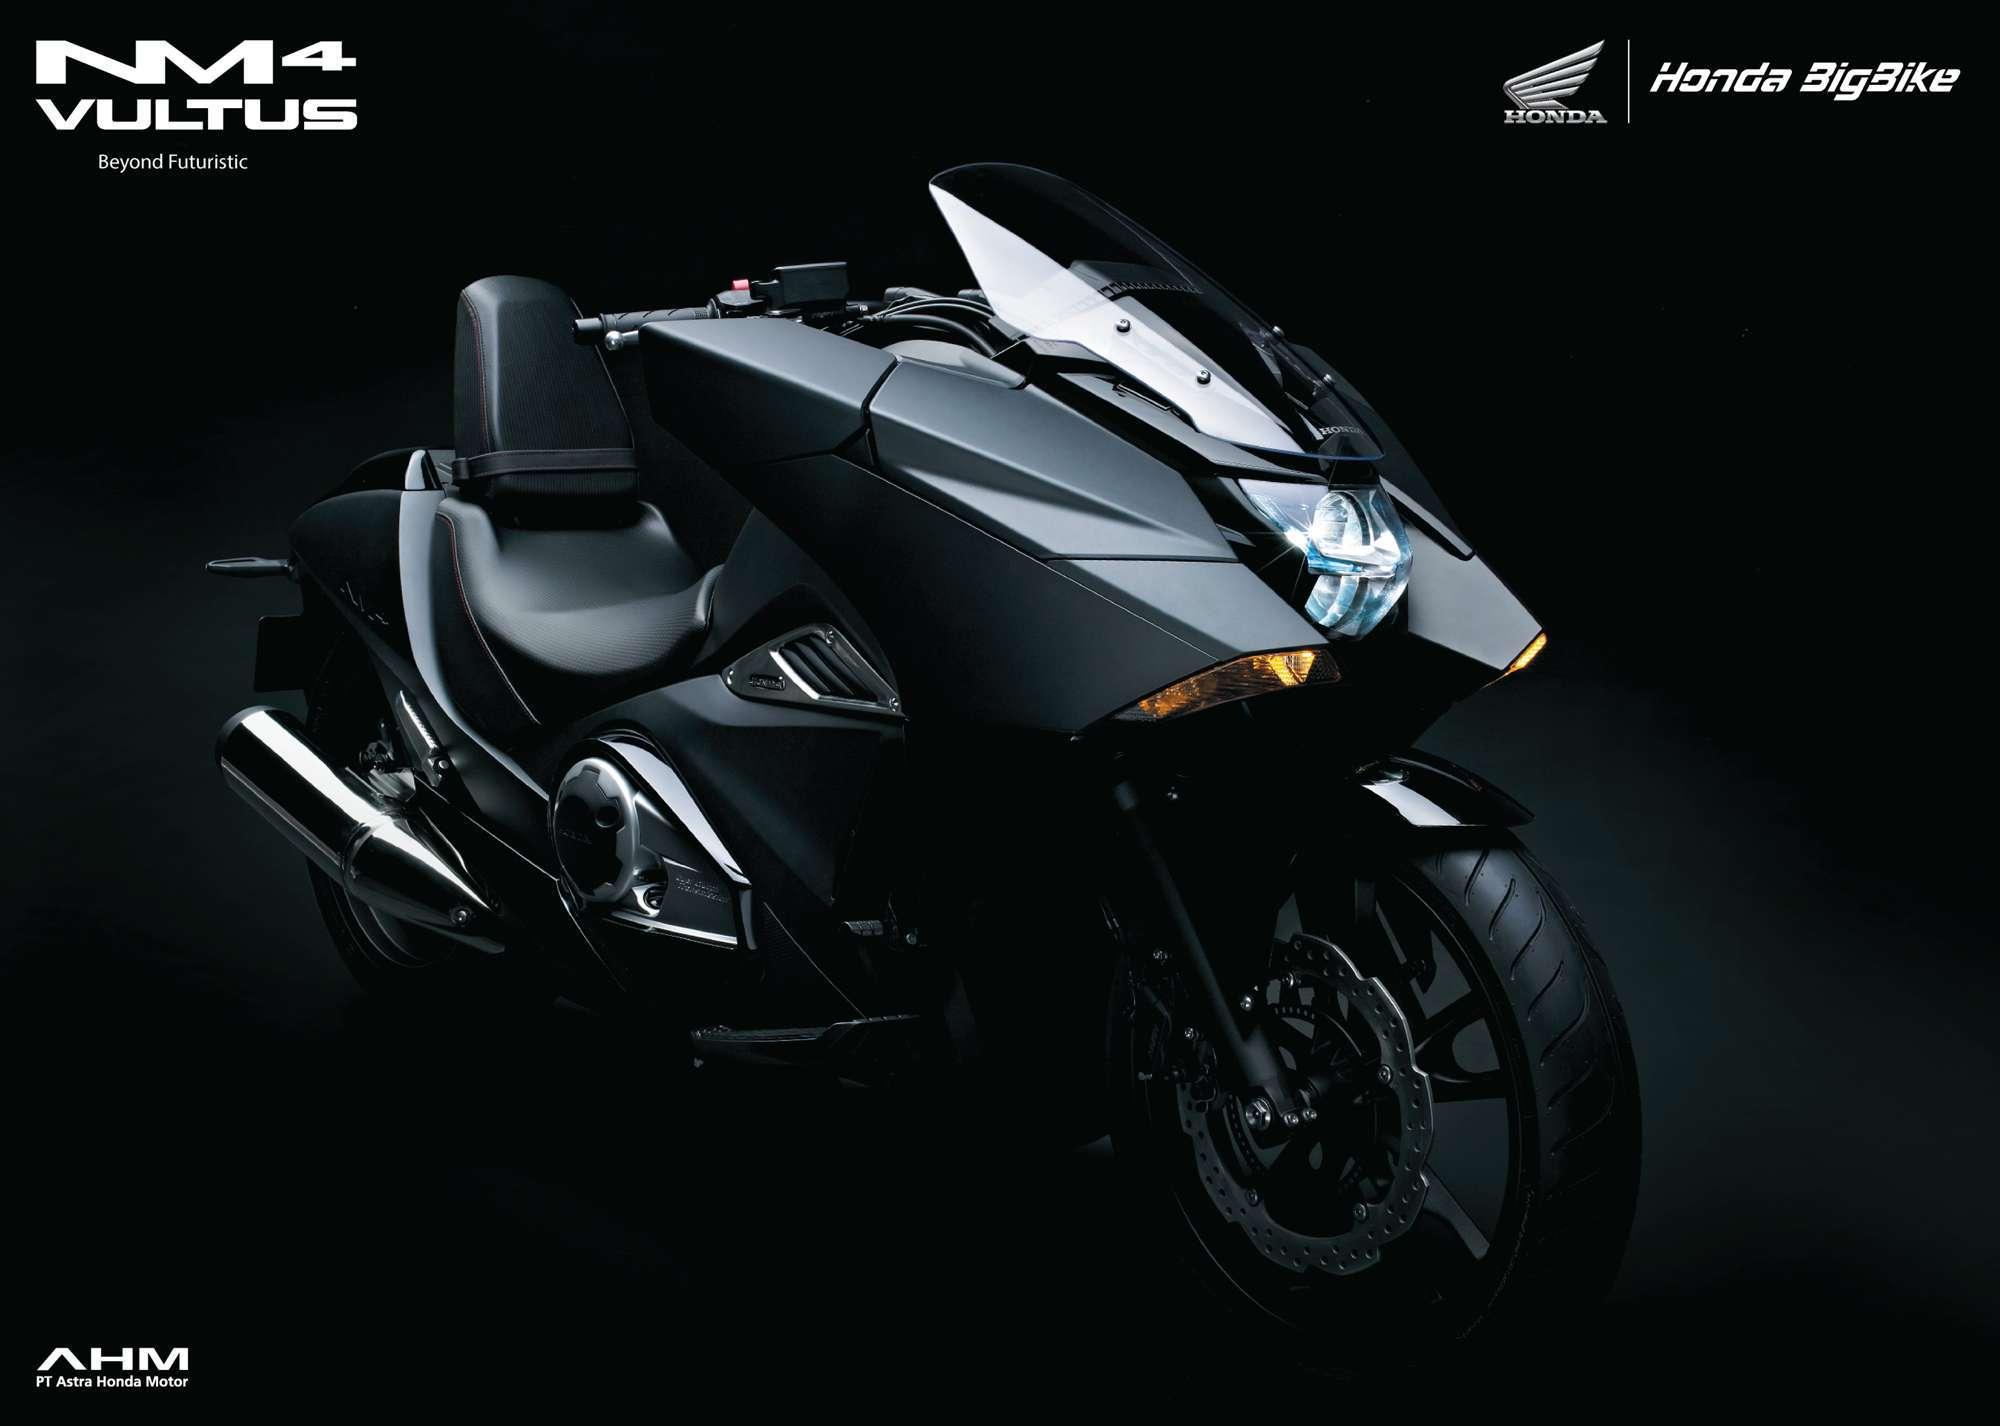 Honda Beat Esppop Kredit Motor Dp Murah Jakarta T New Sporty Esp Cbs Iss 2017 Brosur Nm4 Vultus